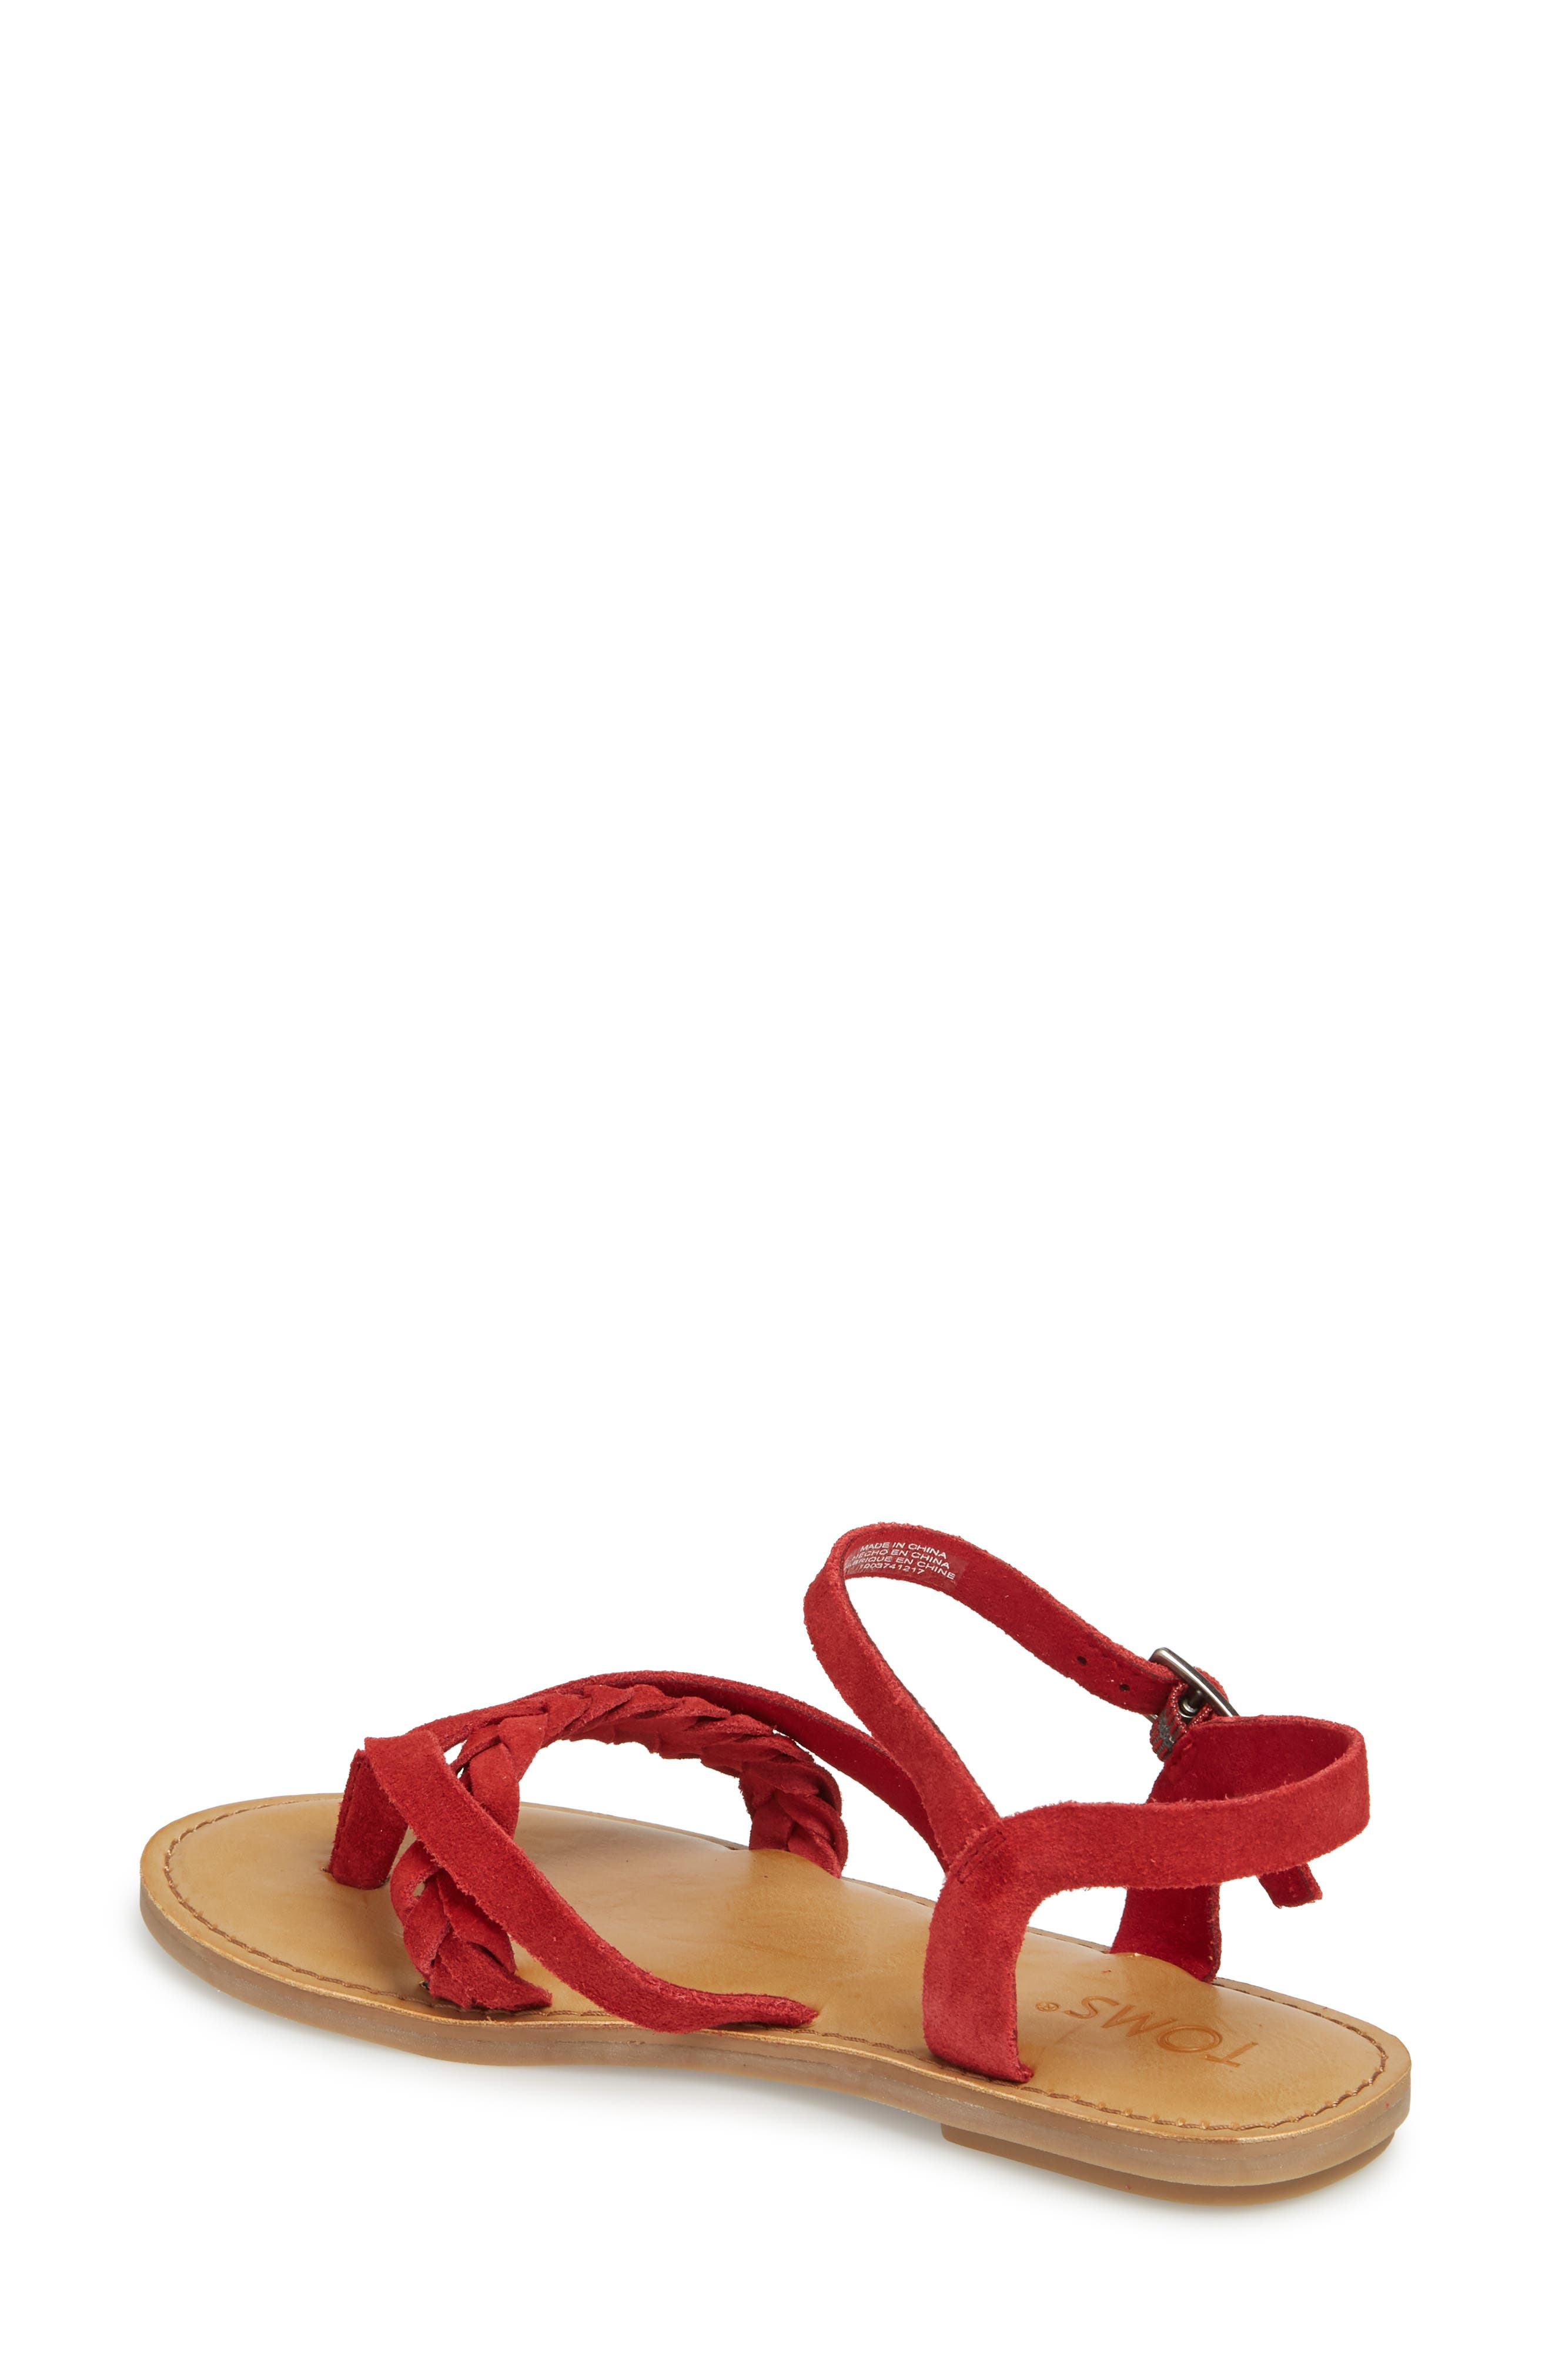 'Lexie' Sandal,                             Alternate thumbnail 2, color,                             601